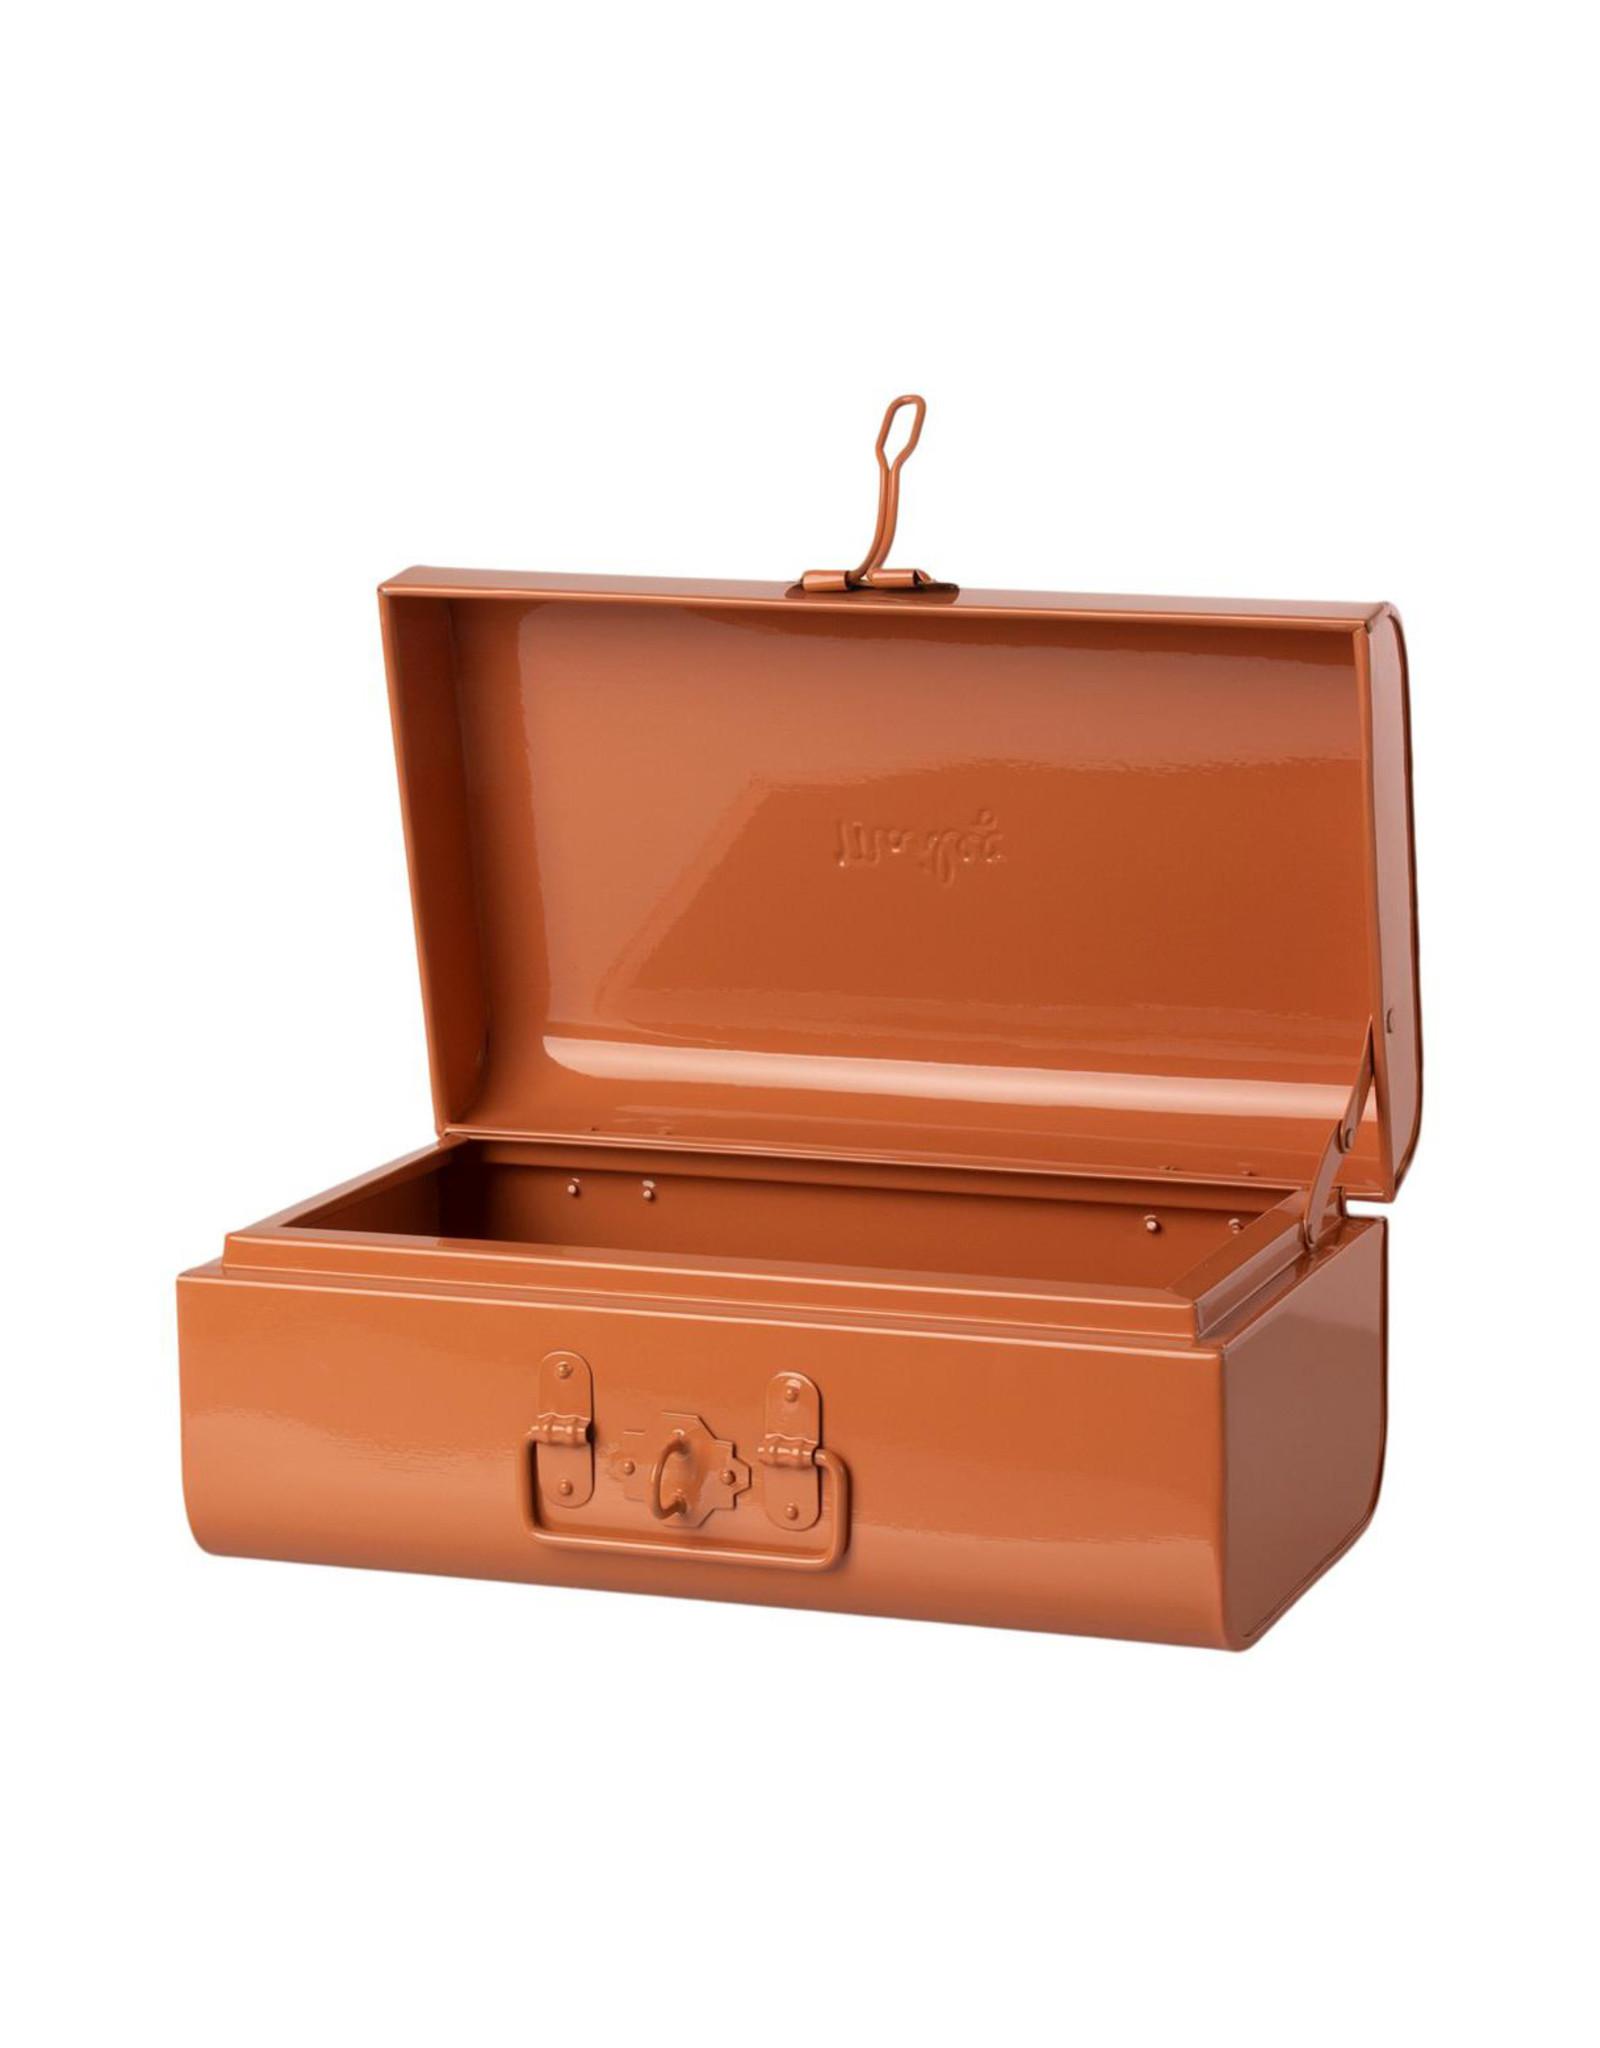 Maileg Small Storage Suitcase - Rose